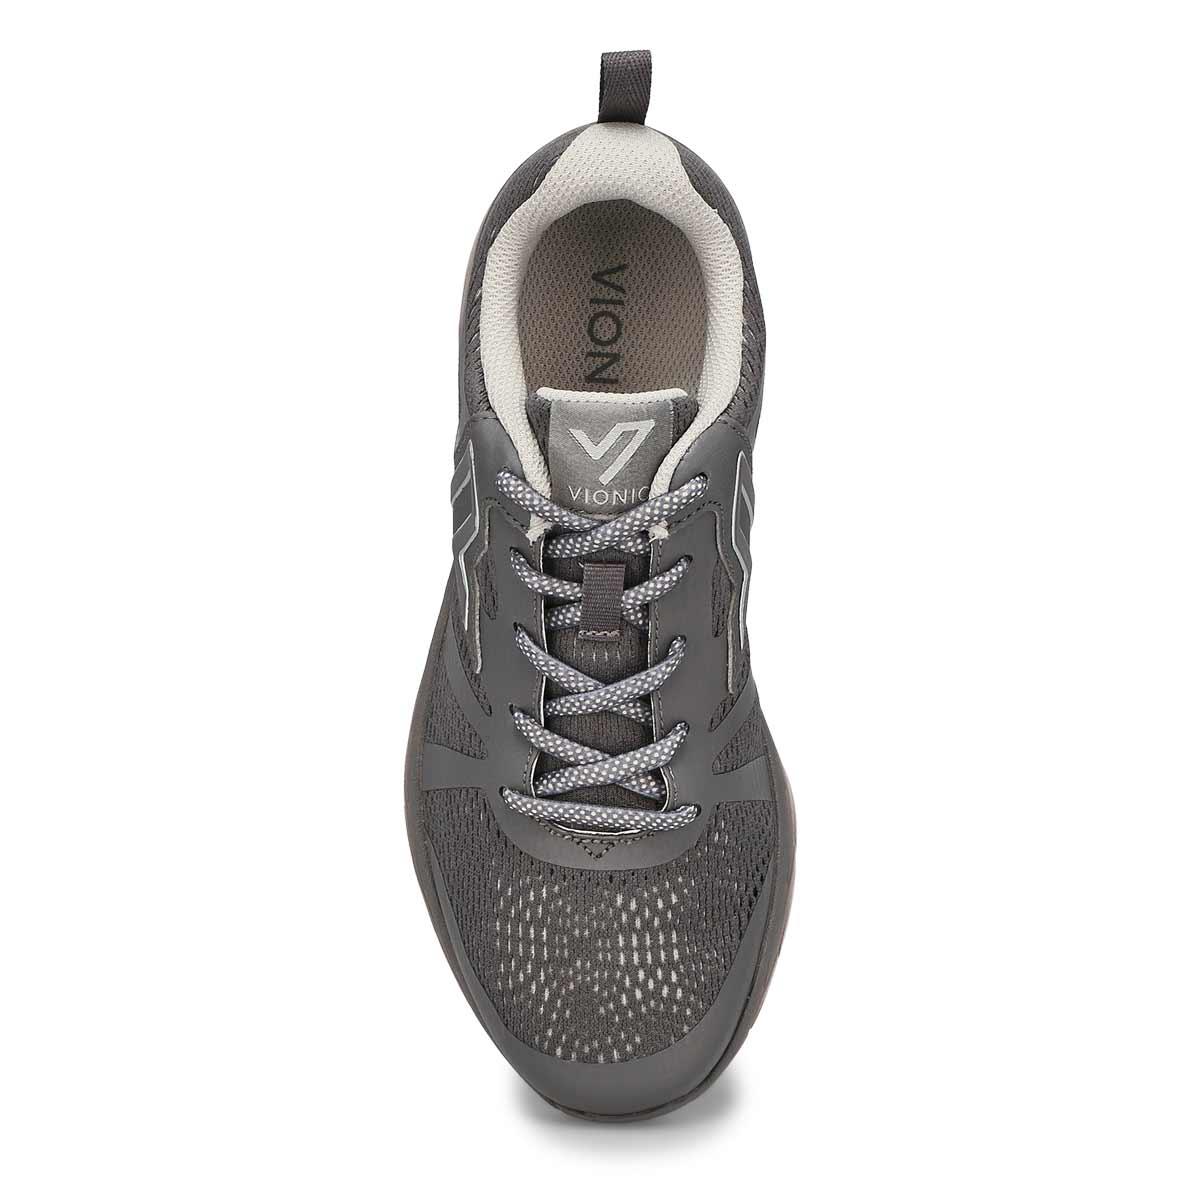 Lds 335Miles grey running shoe